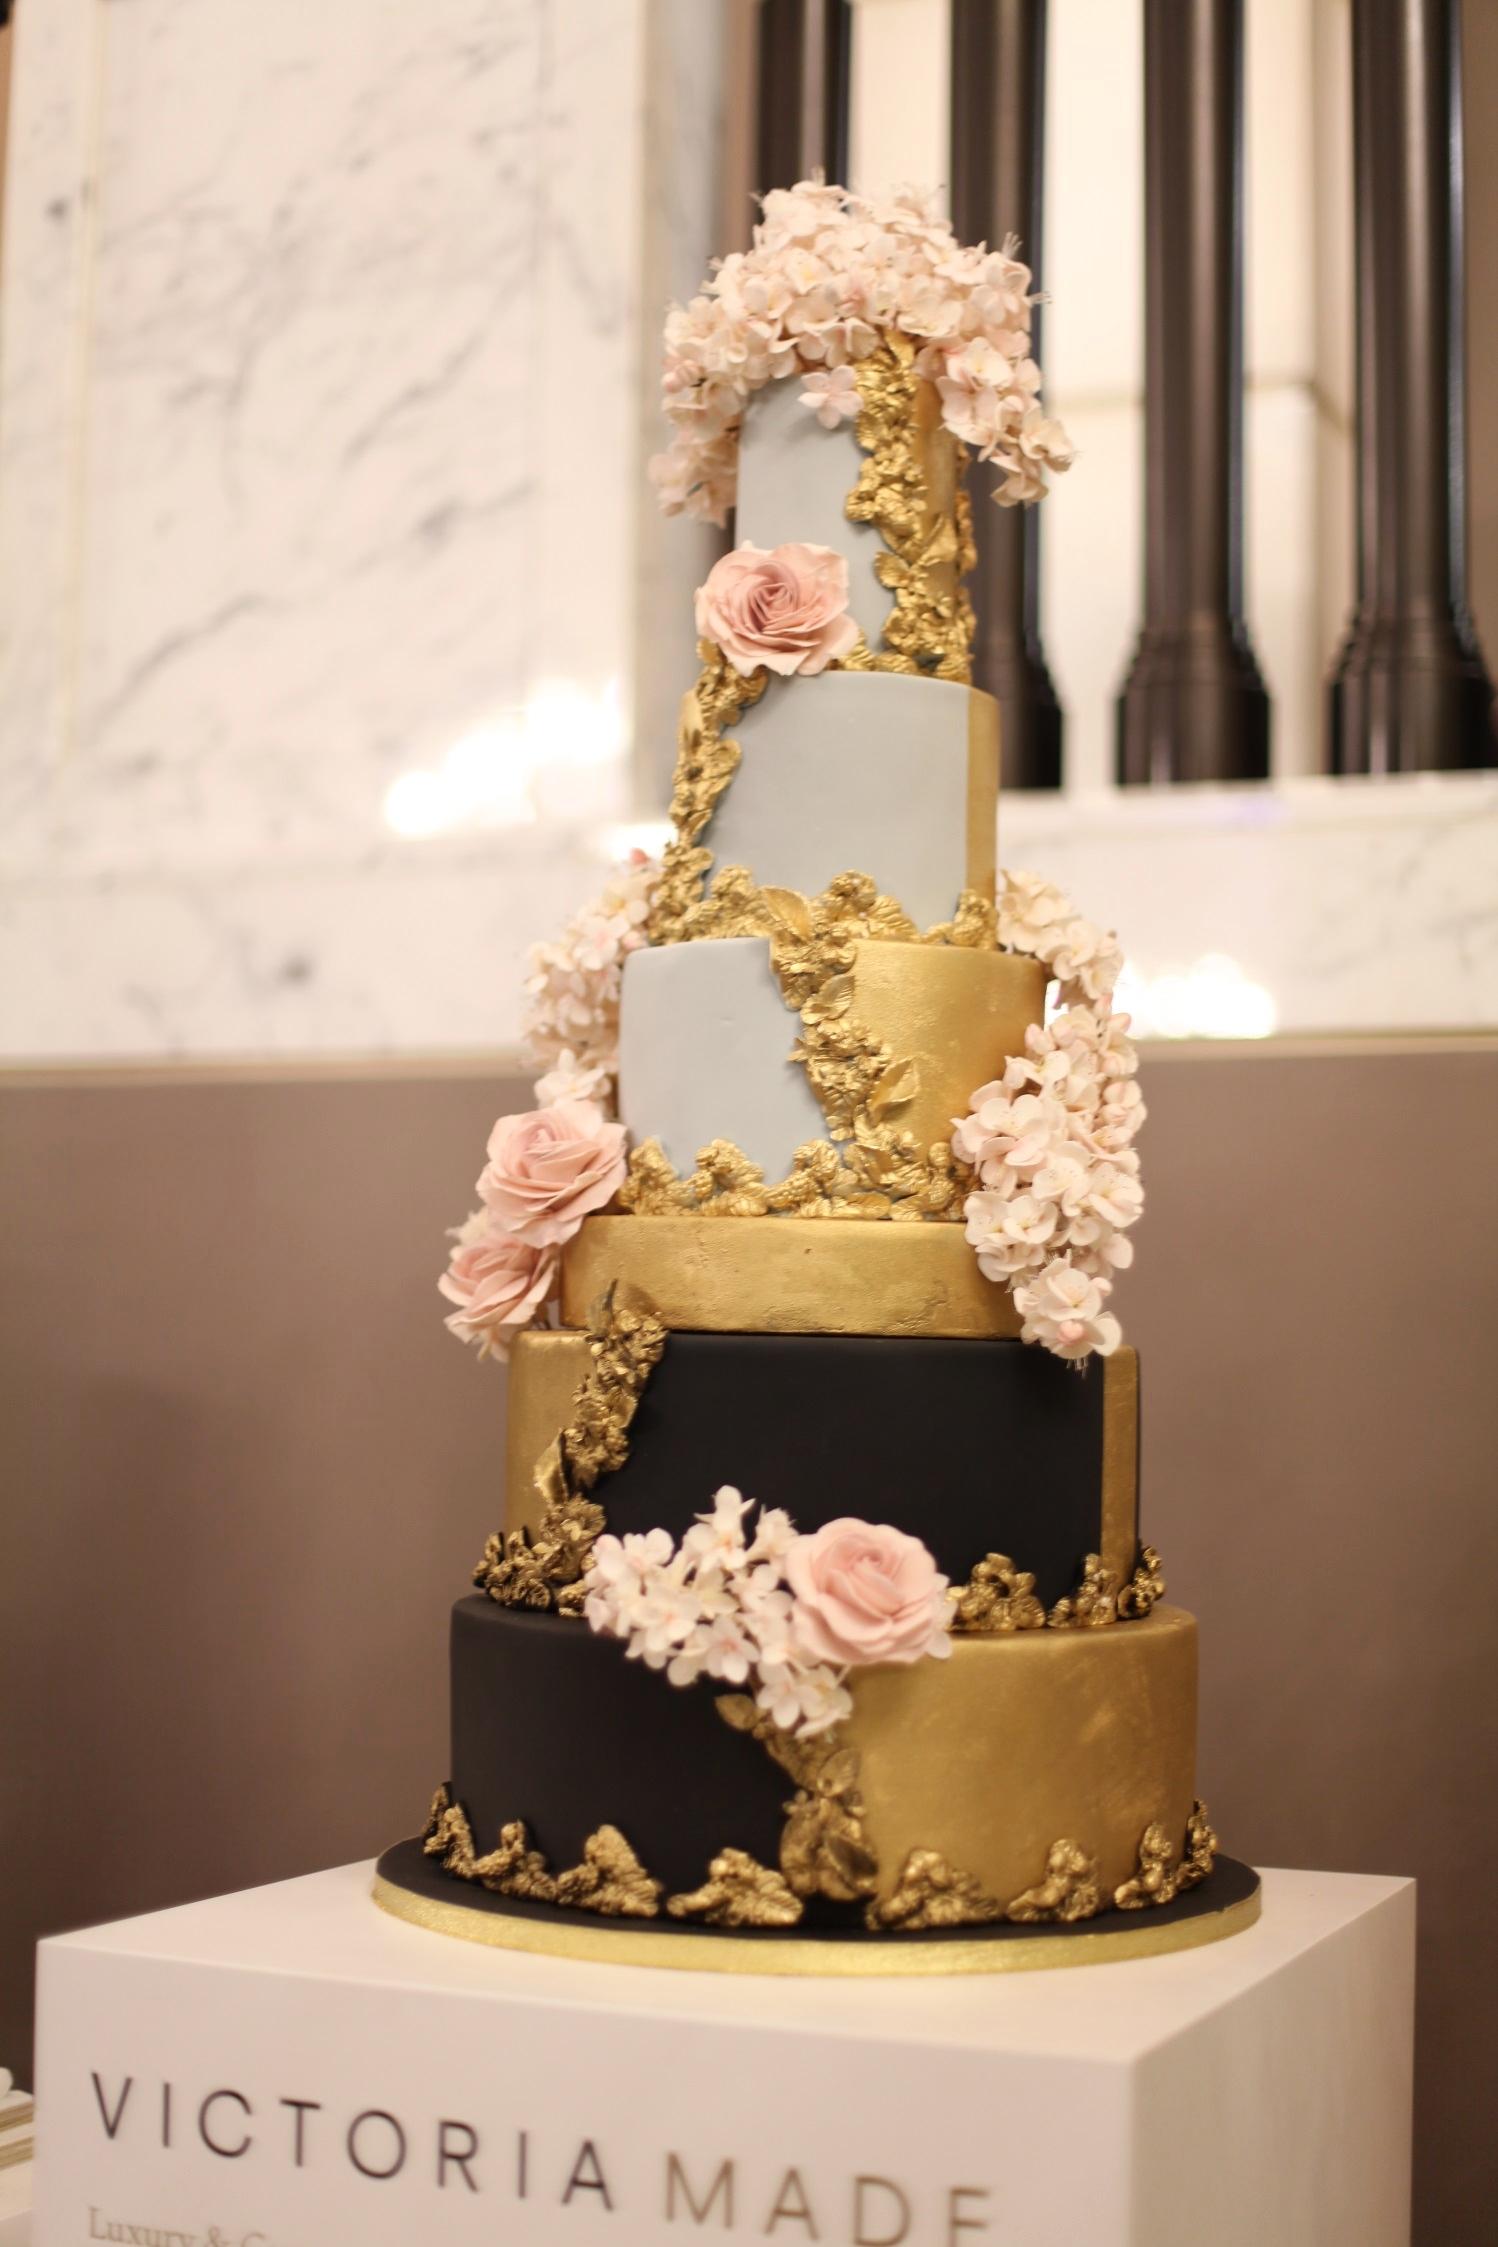 Victoria Made Wedding Cake (27) - Copy.jpg